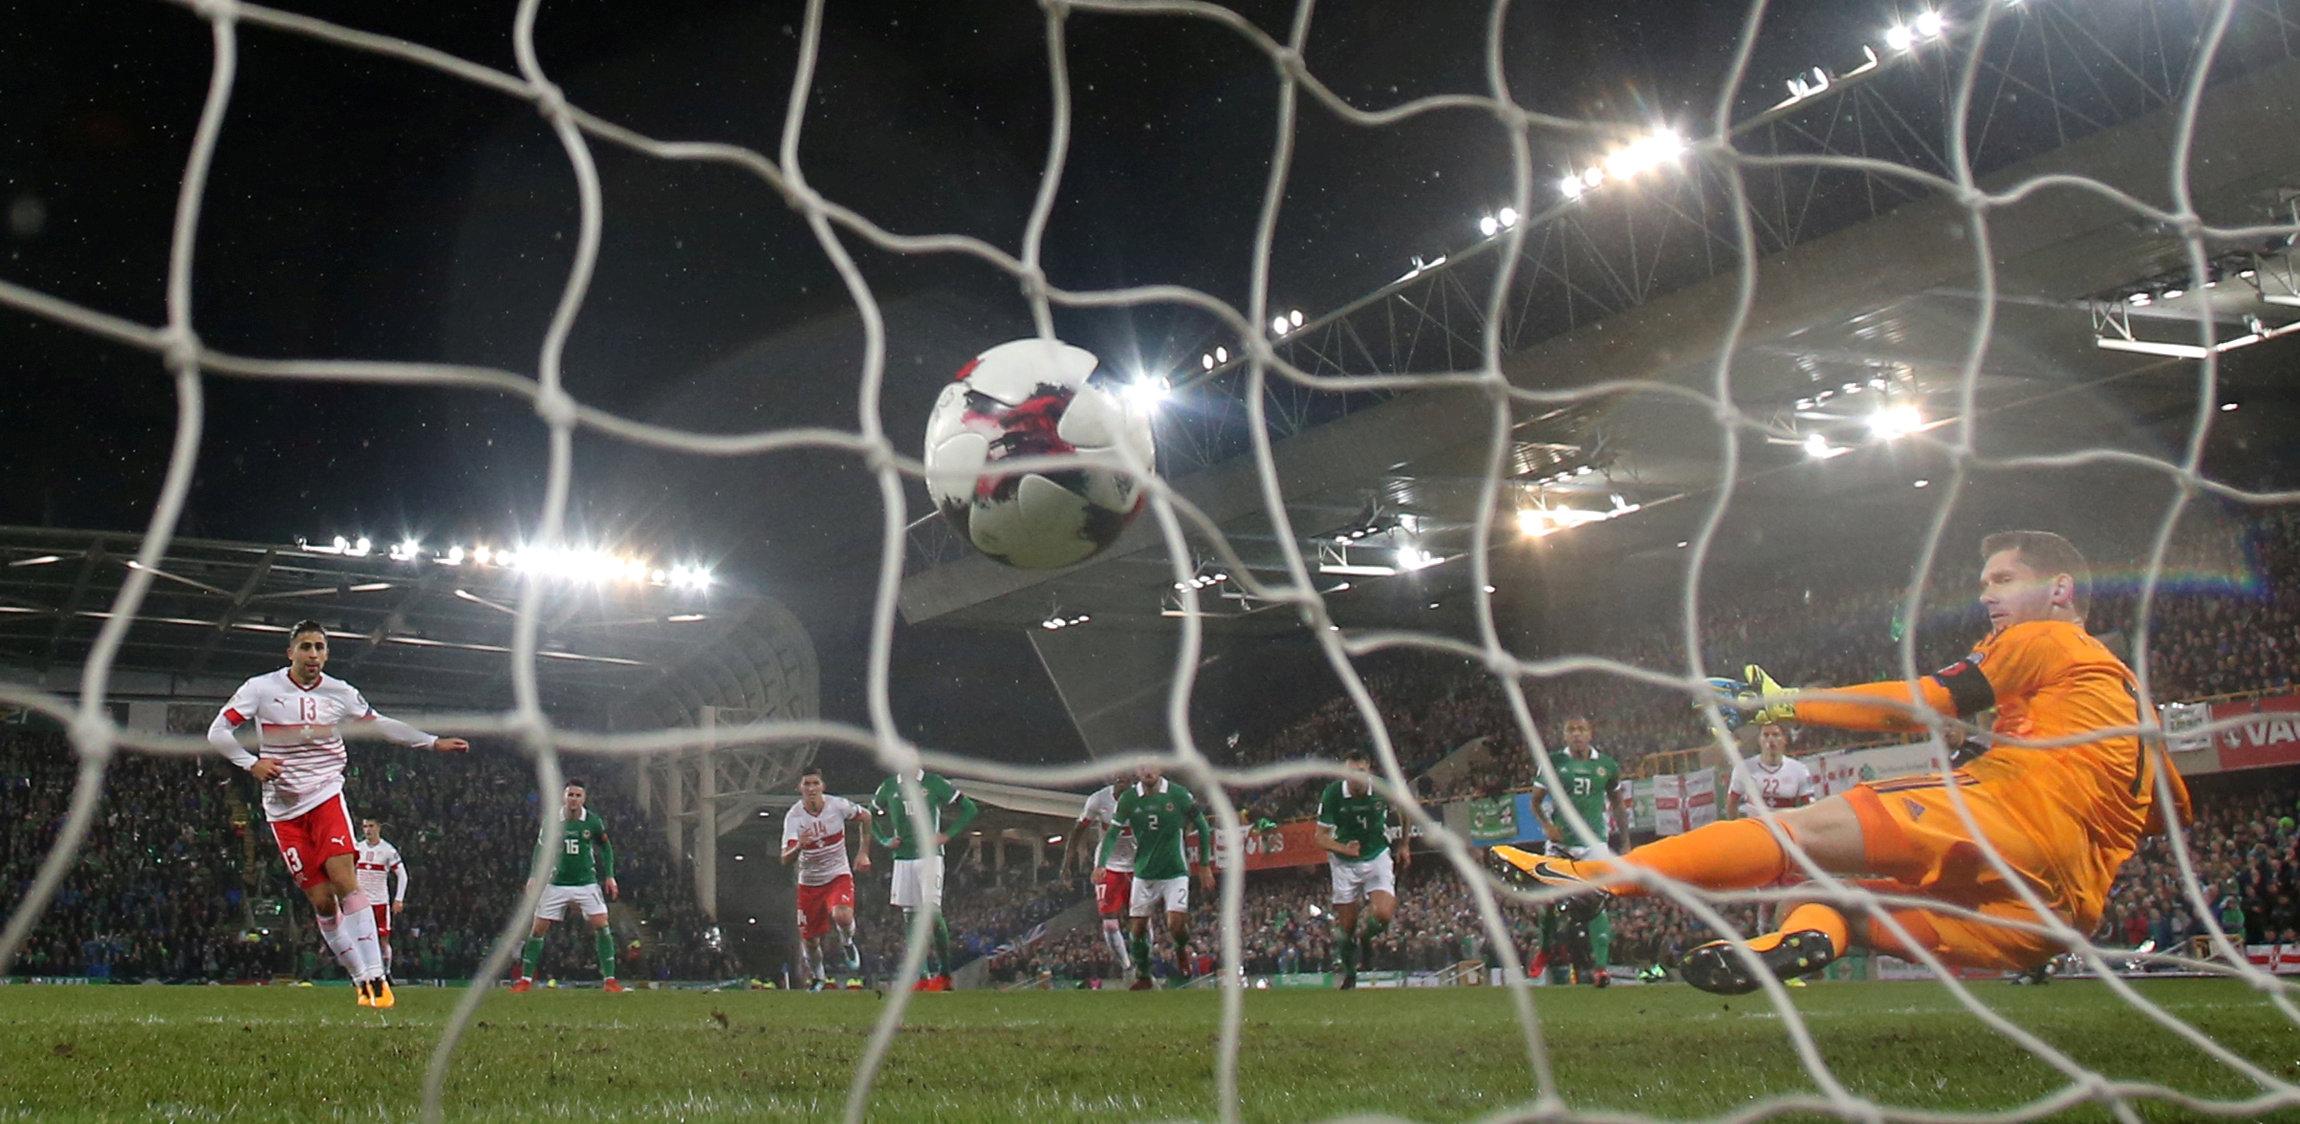 Soccer Football - 2018 World Cup Qualifications - Europe - Northern Ireland vs Switzerland - National Stadium, Belfast, Brita